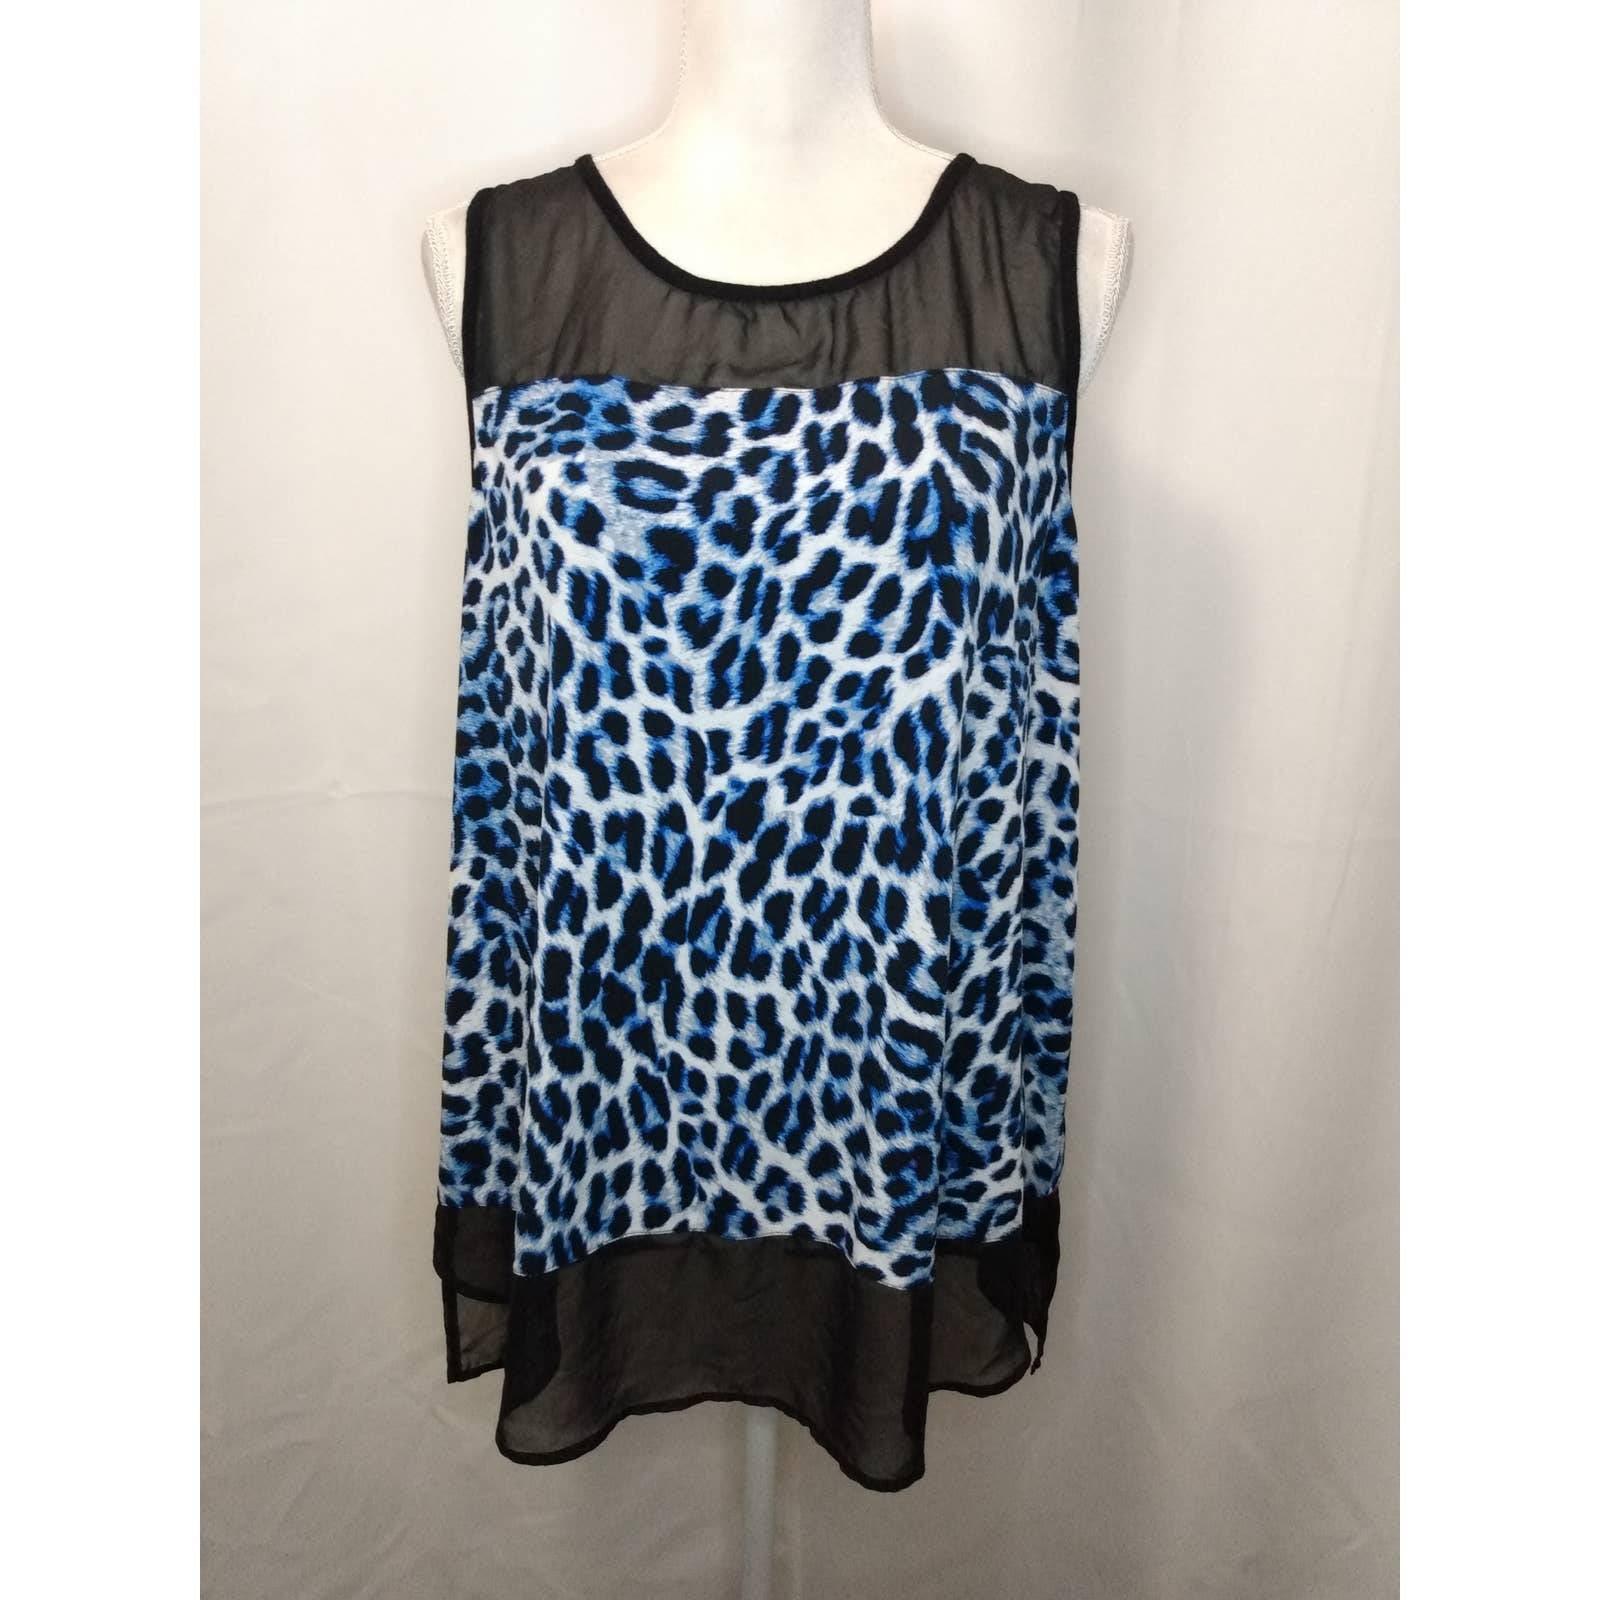 Vince Camuto blue leopard tank top